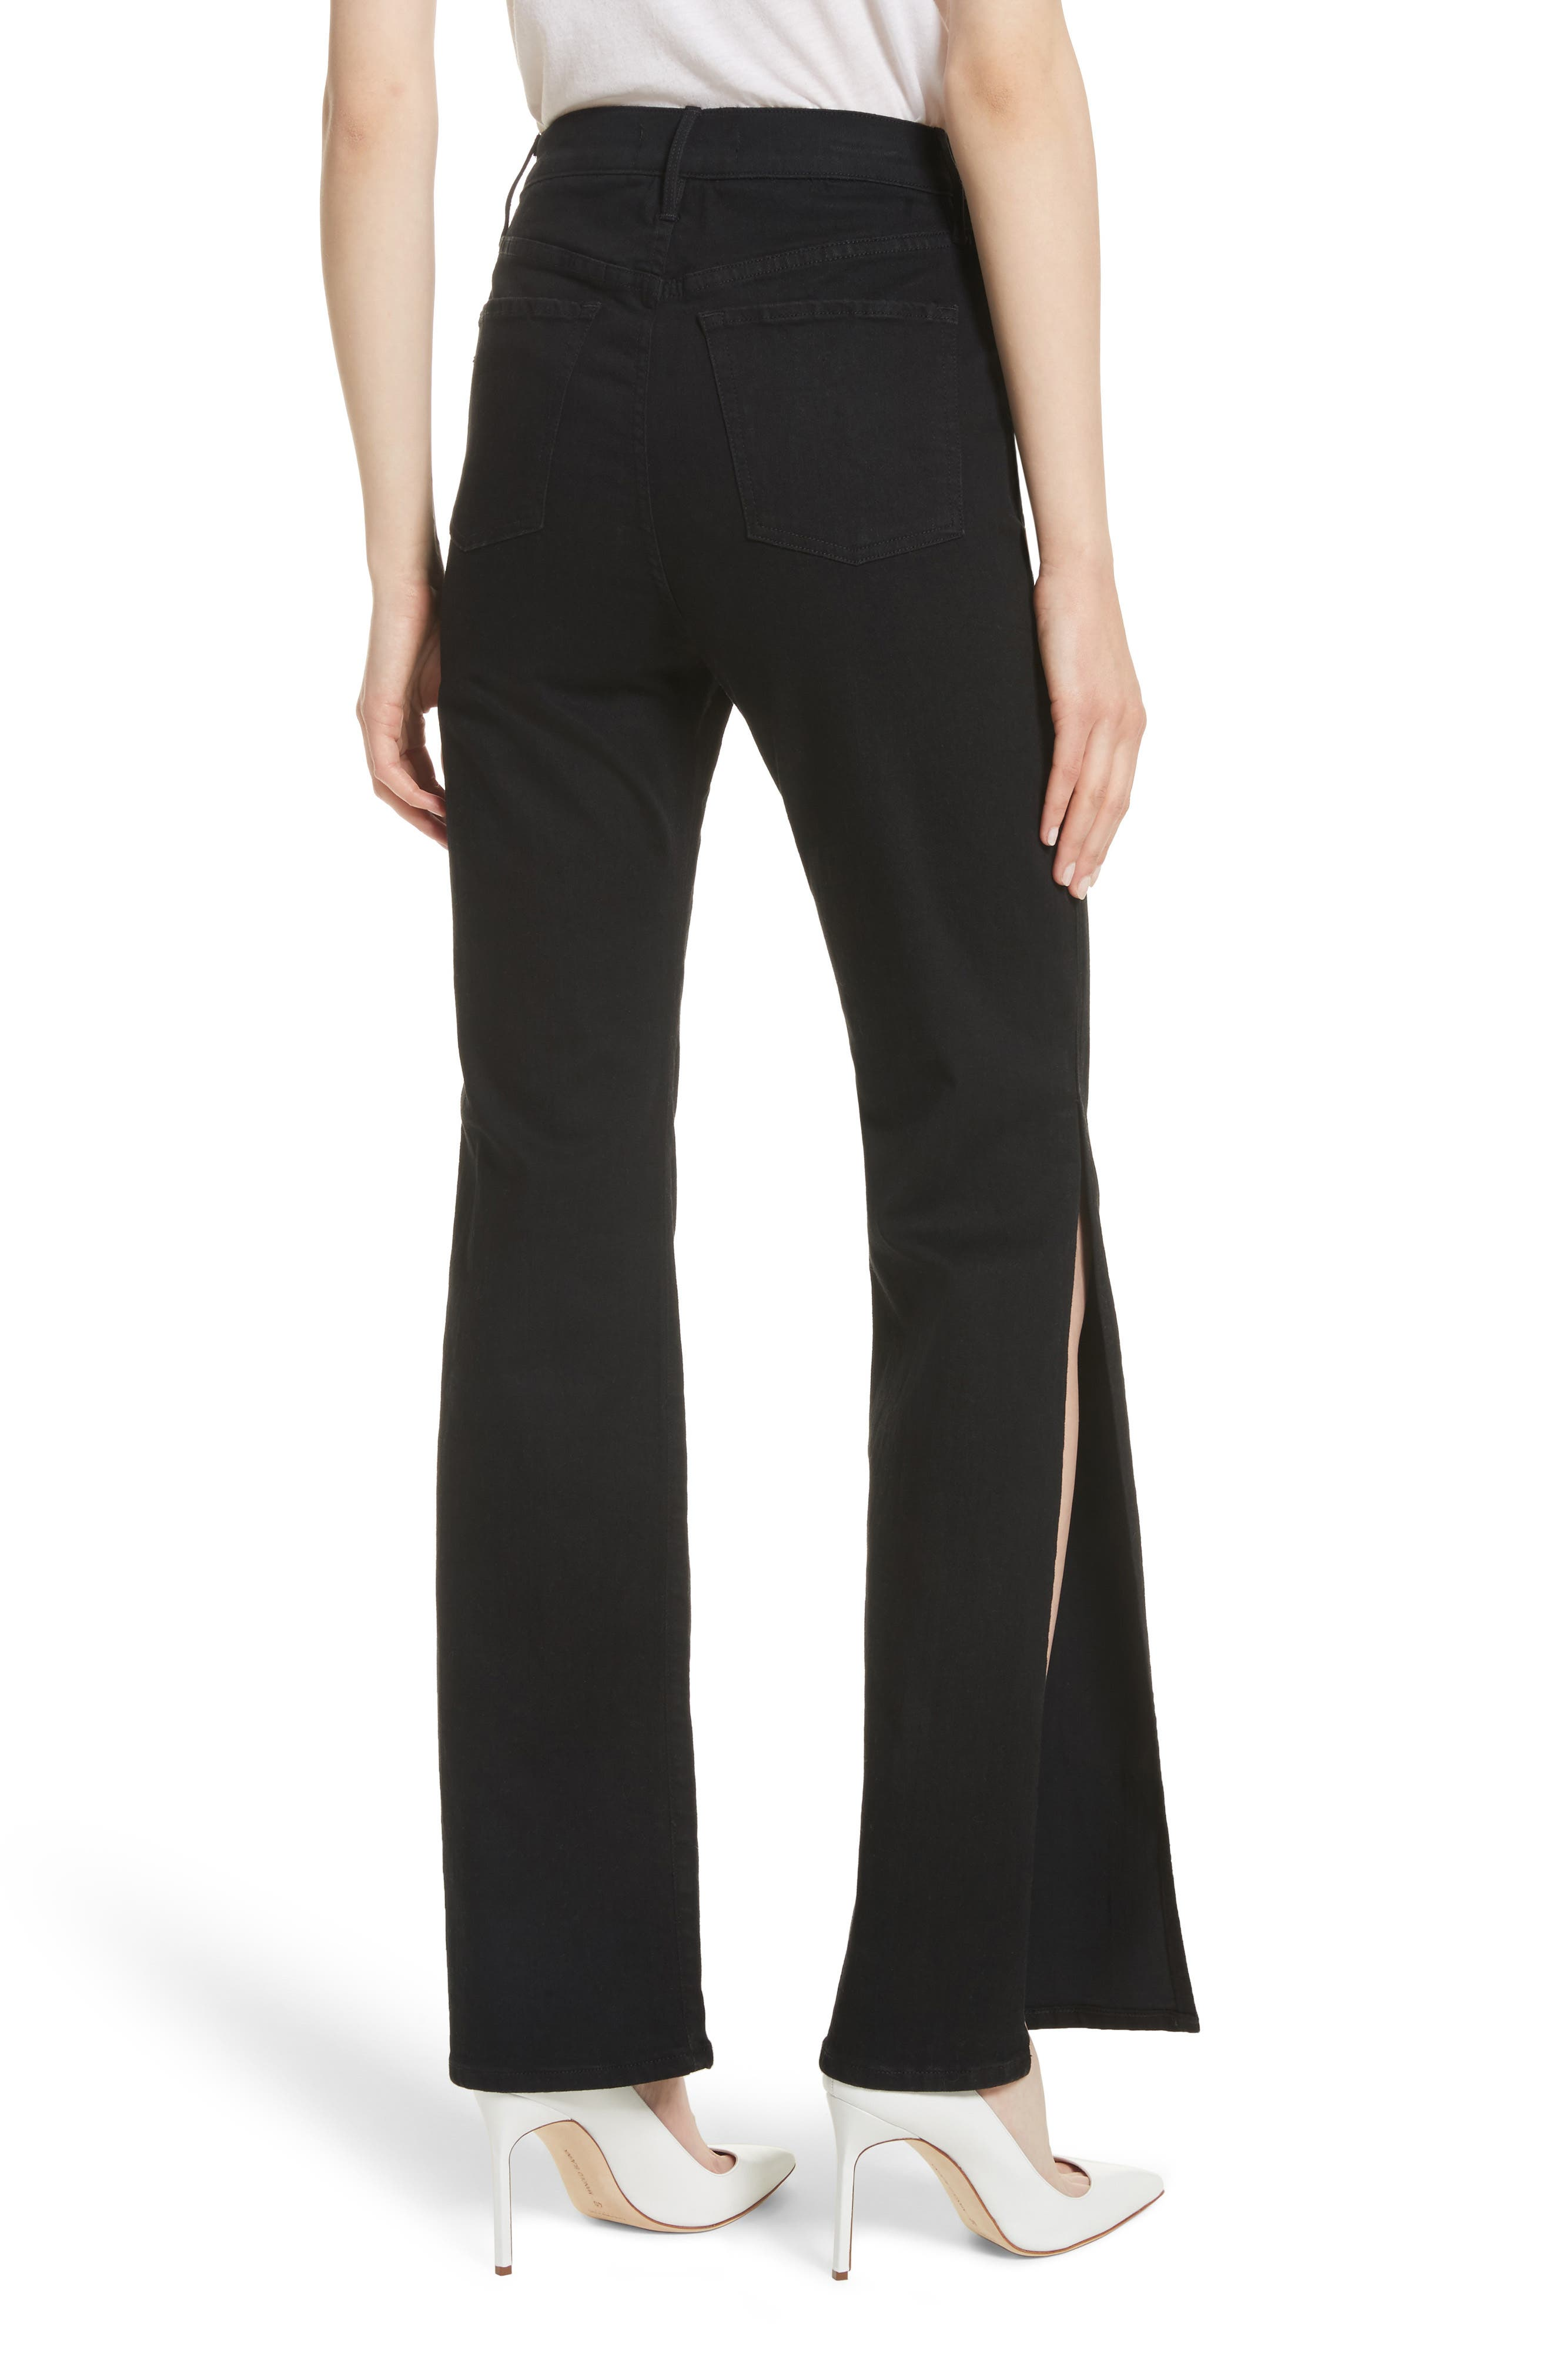 W4 Adeline High Waist Split Flare Jeans,                             Alternate thumbnail 2, color,                             Black No 1